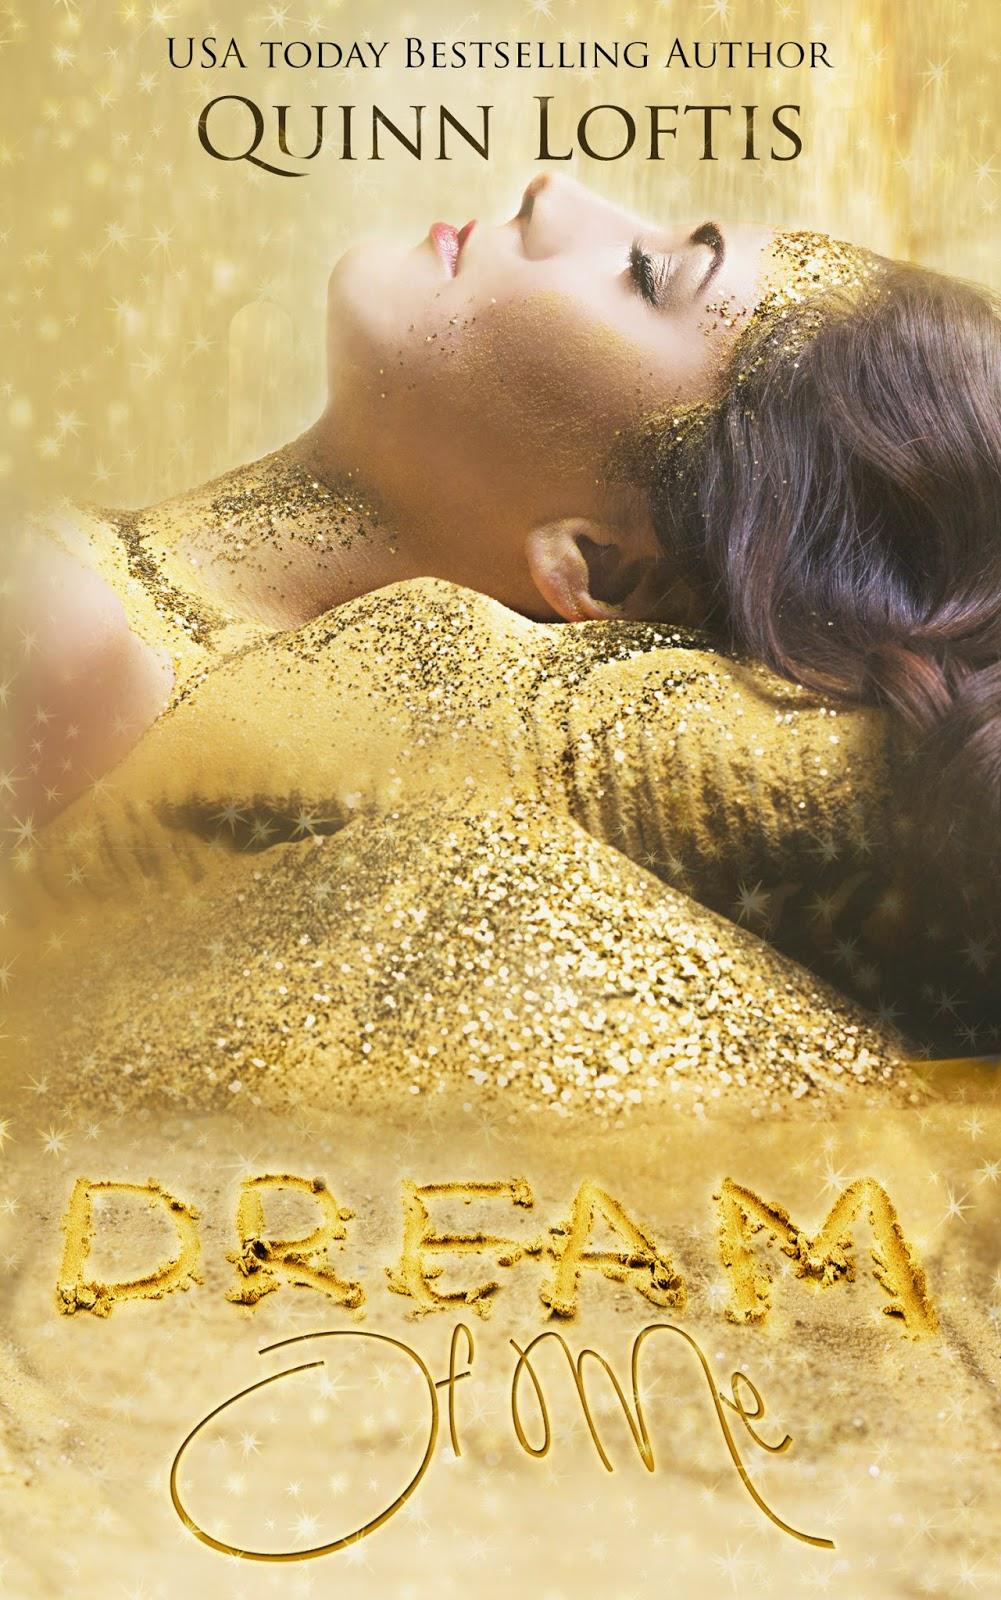 Dream of Me on Goodreads